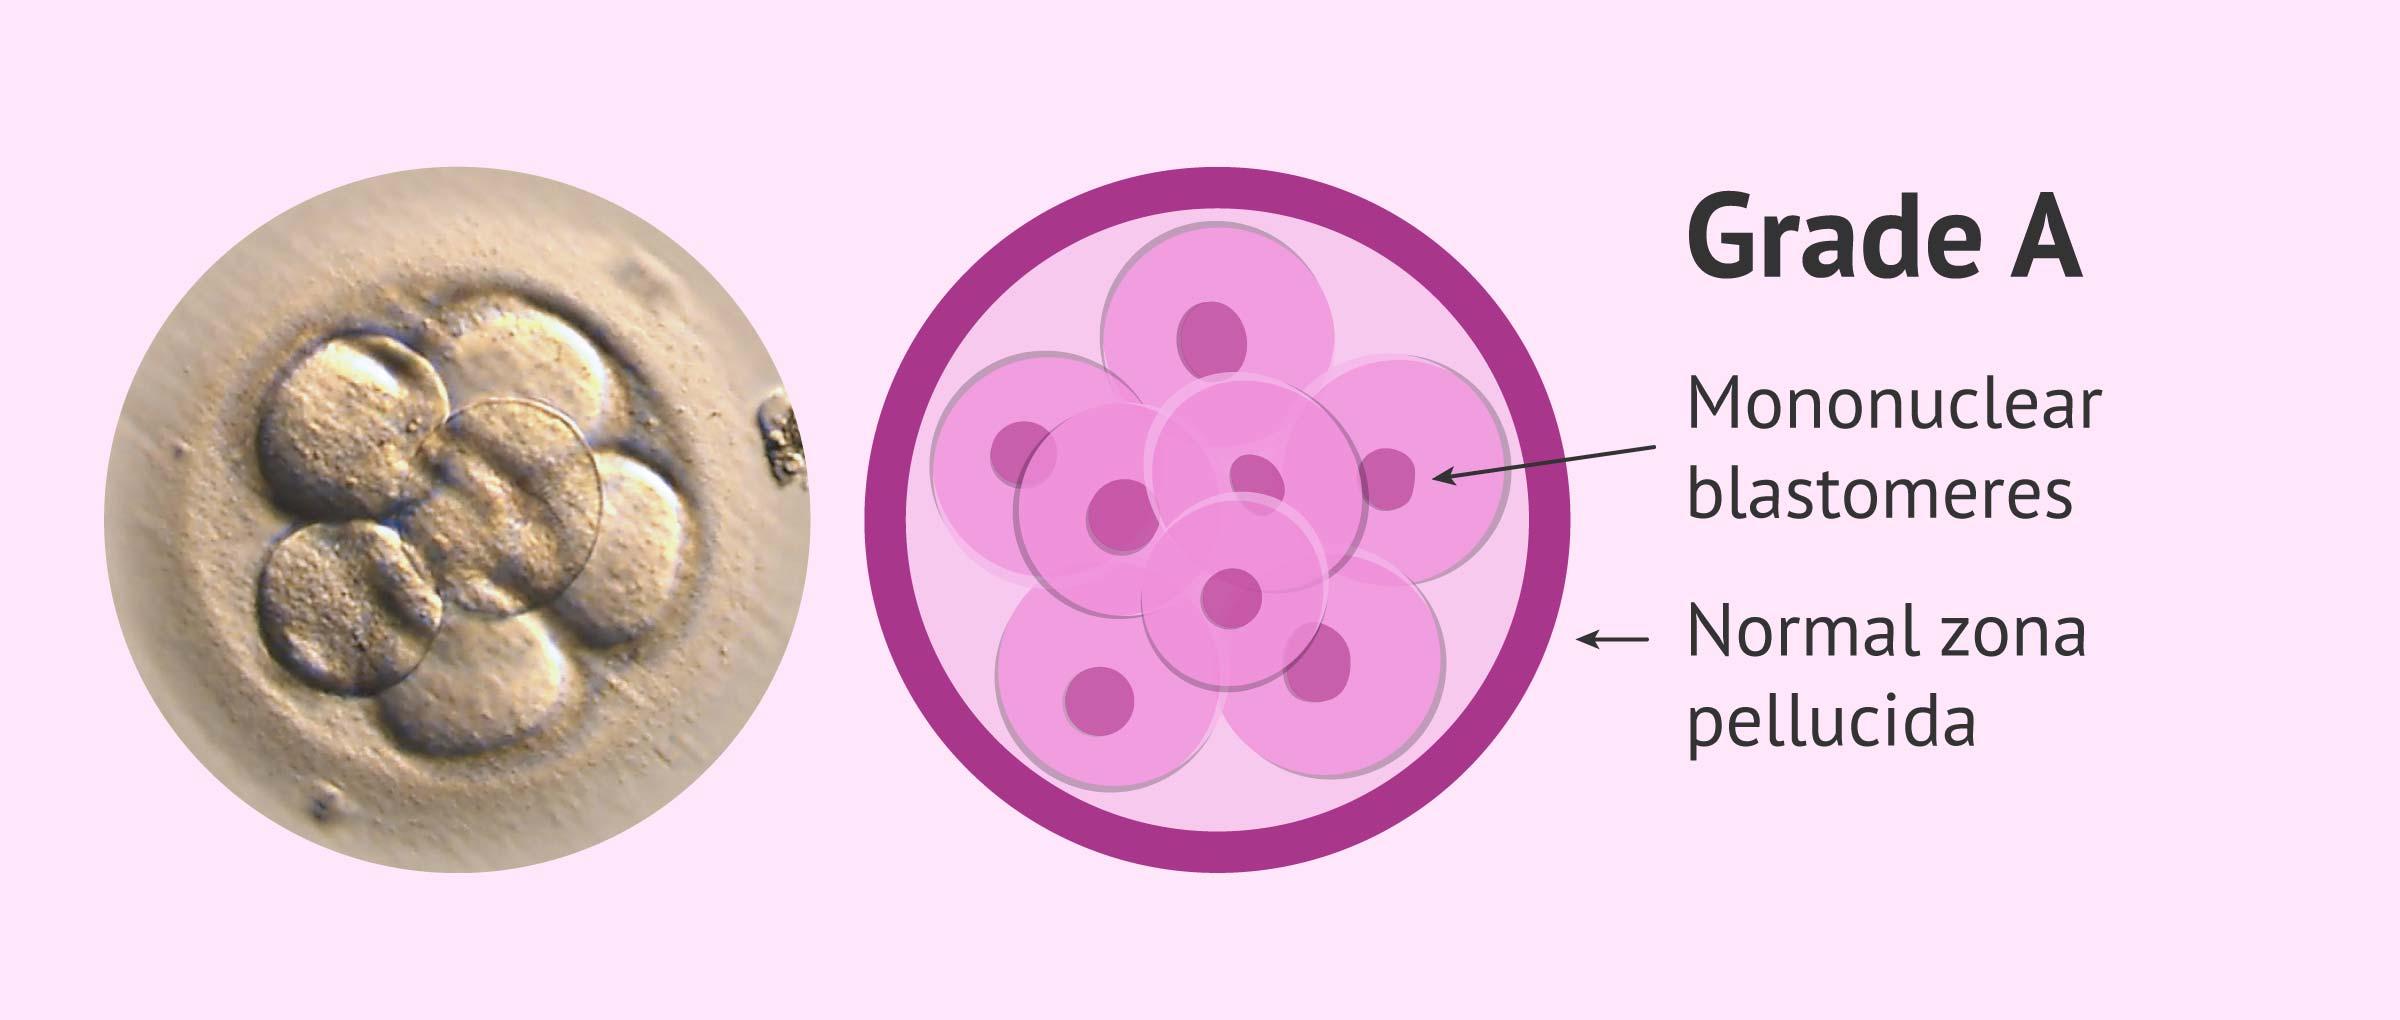 Imagen: Embryo grade A